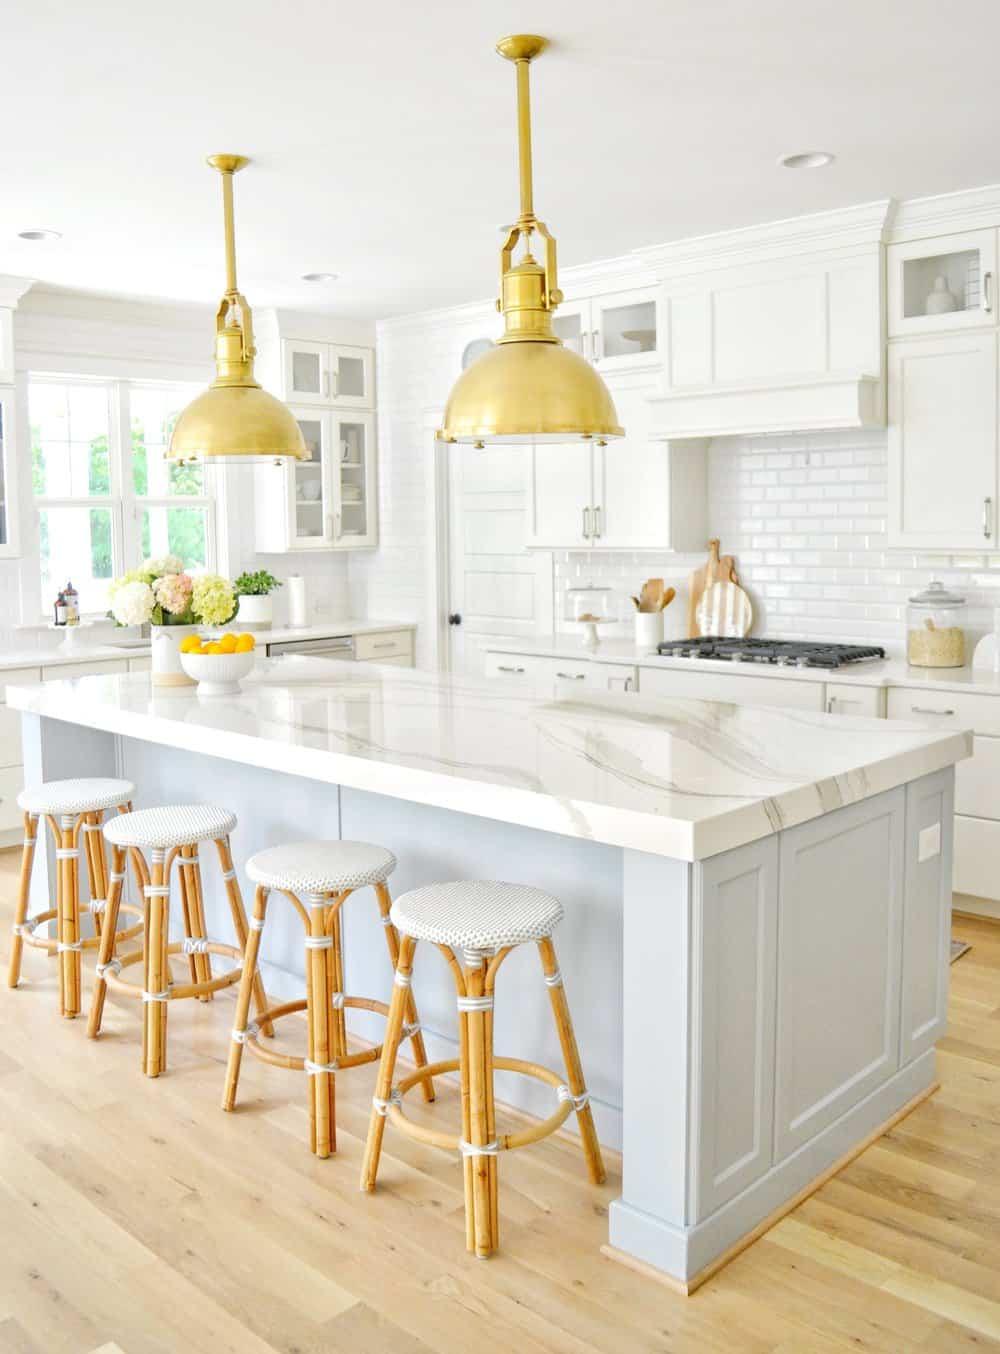 Serena and lily bar stools lined up at a kitchen island